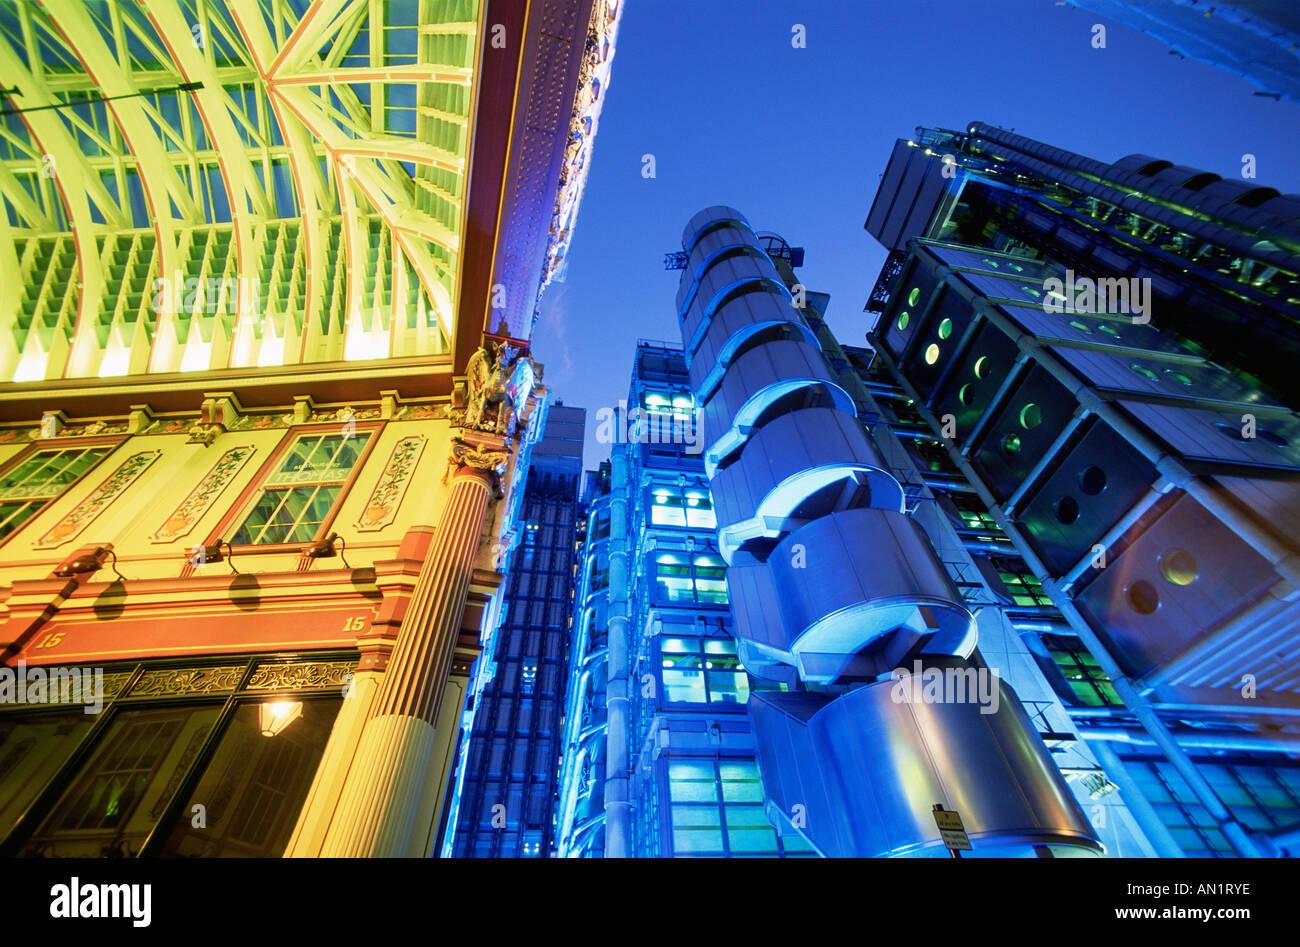 England,London,Leadenhall Street Market and Lloyds Building - Stock Image